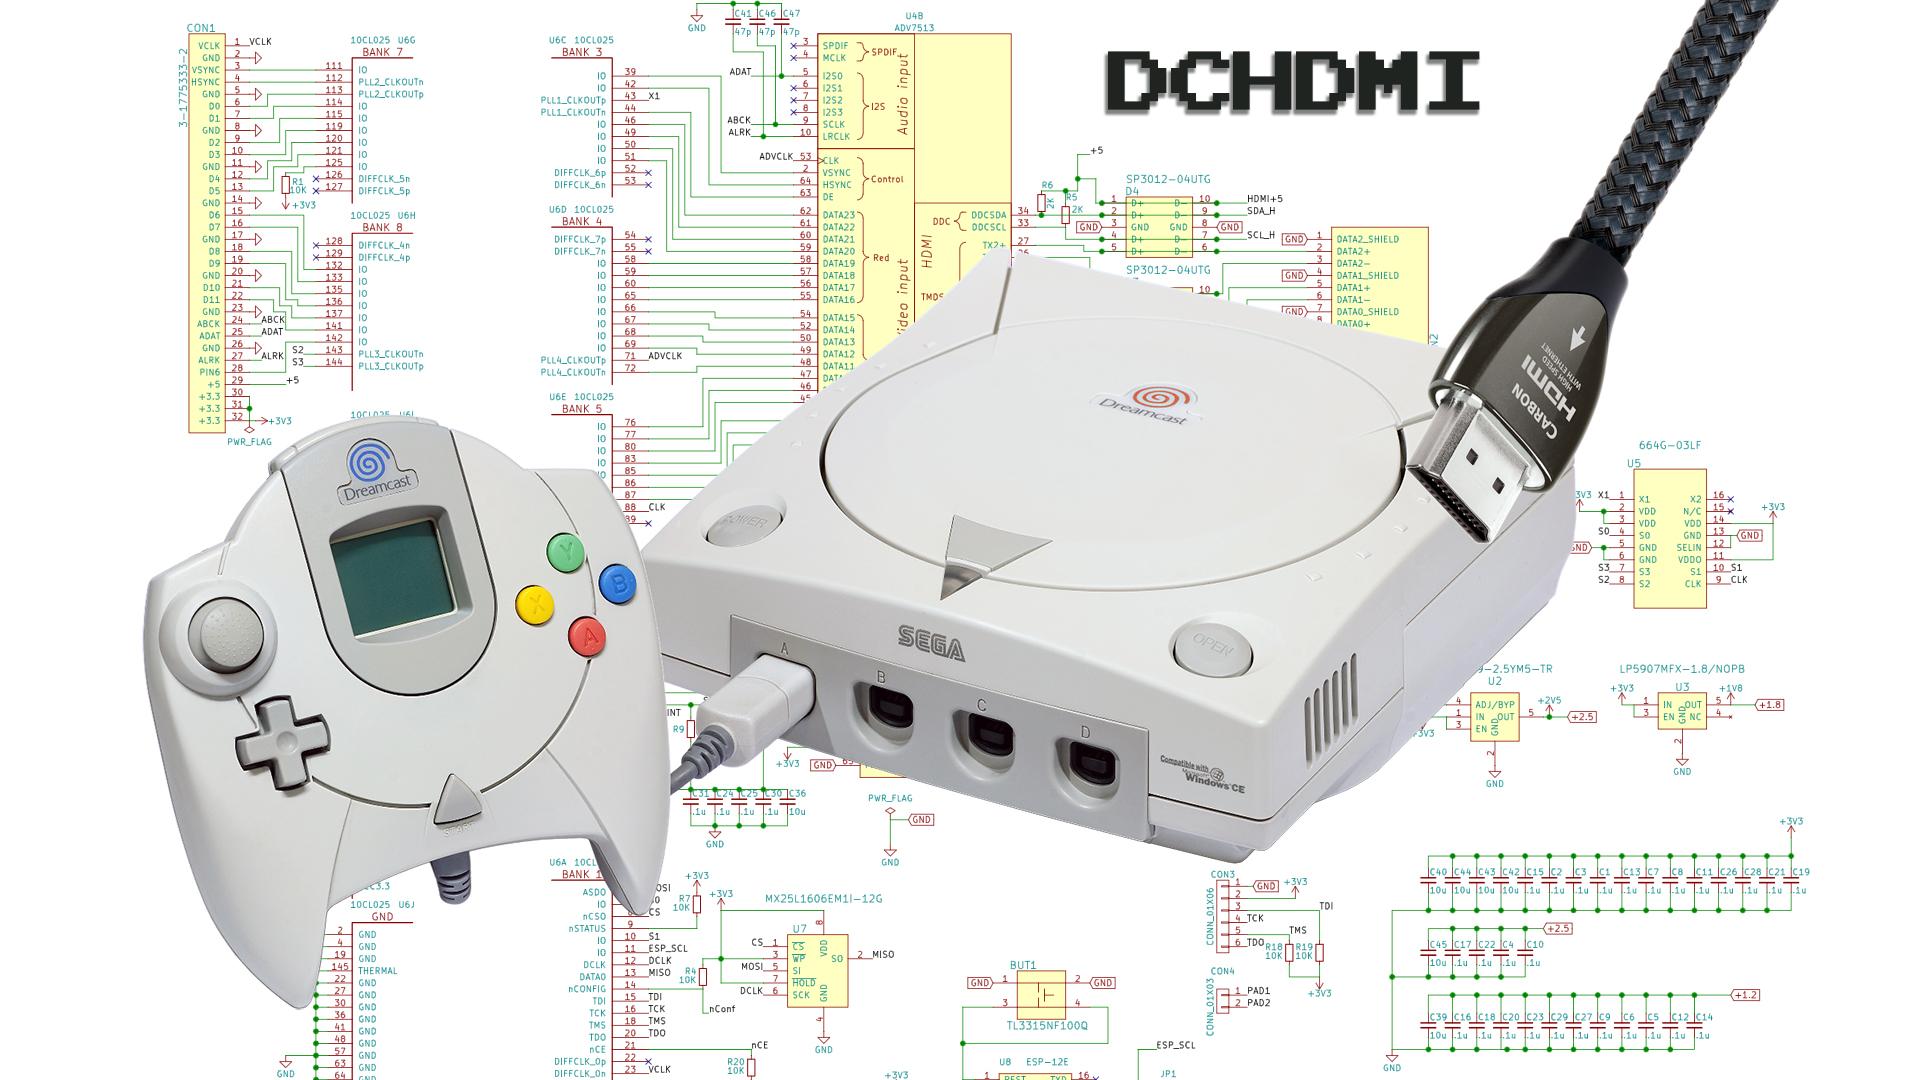 DCHDMI Firmware 4.3